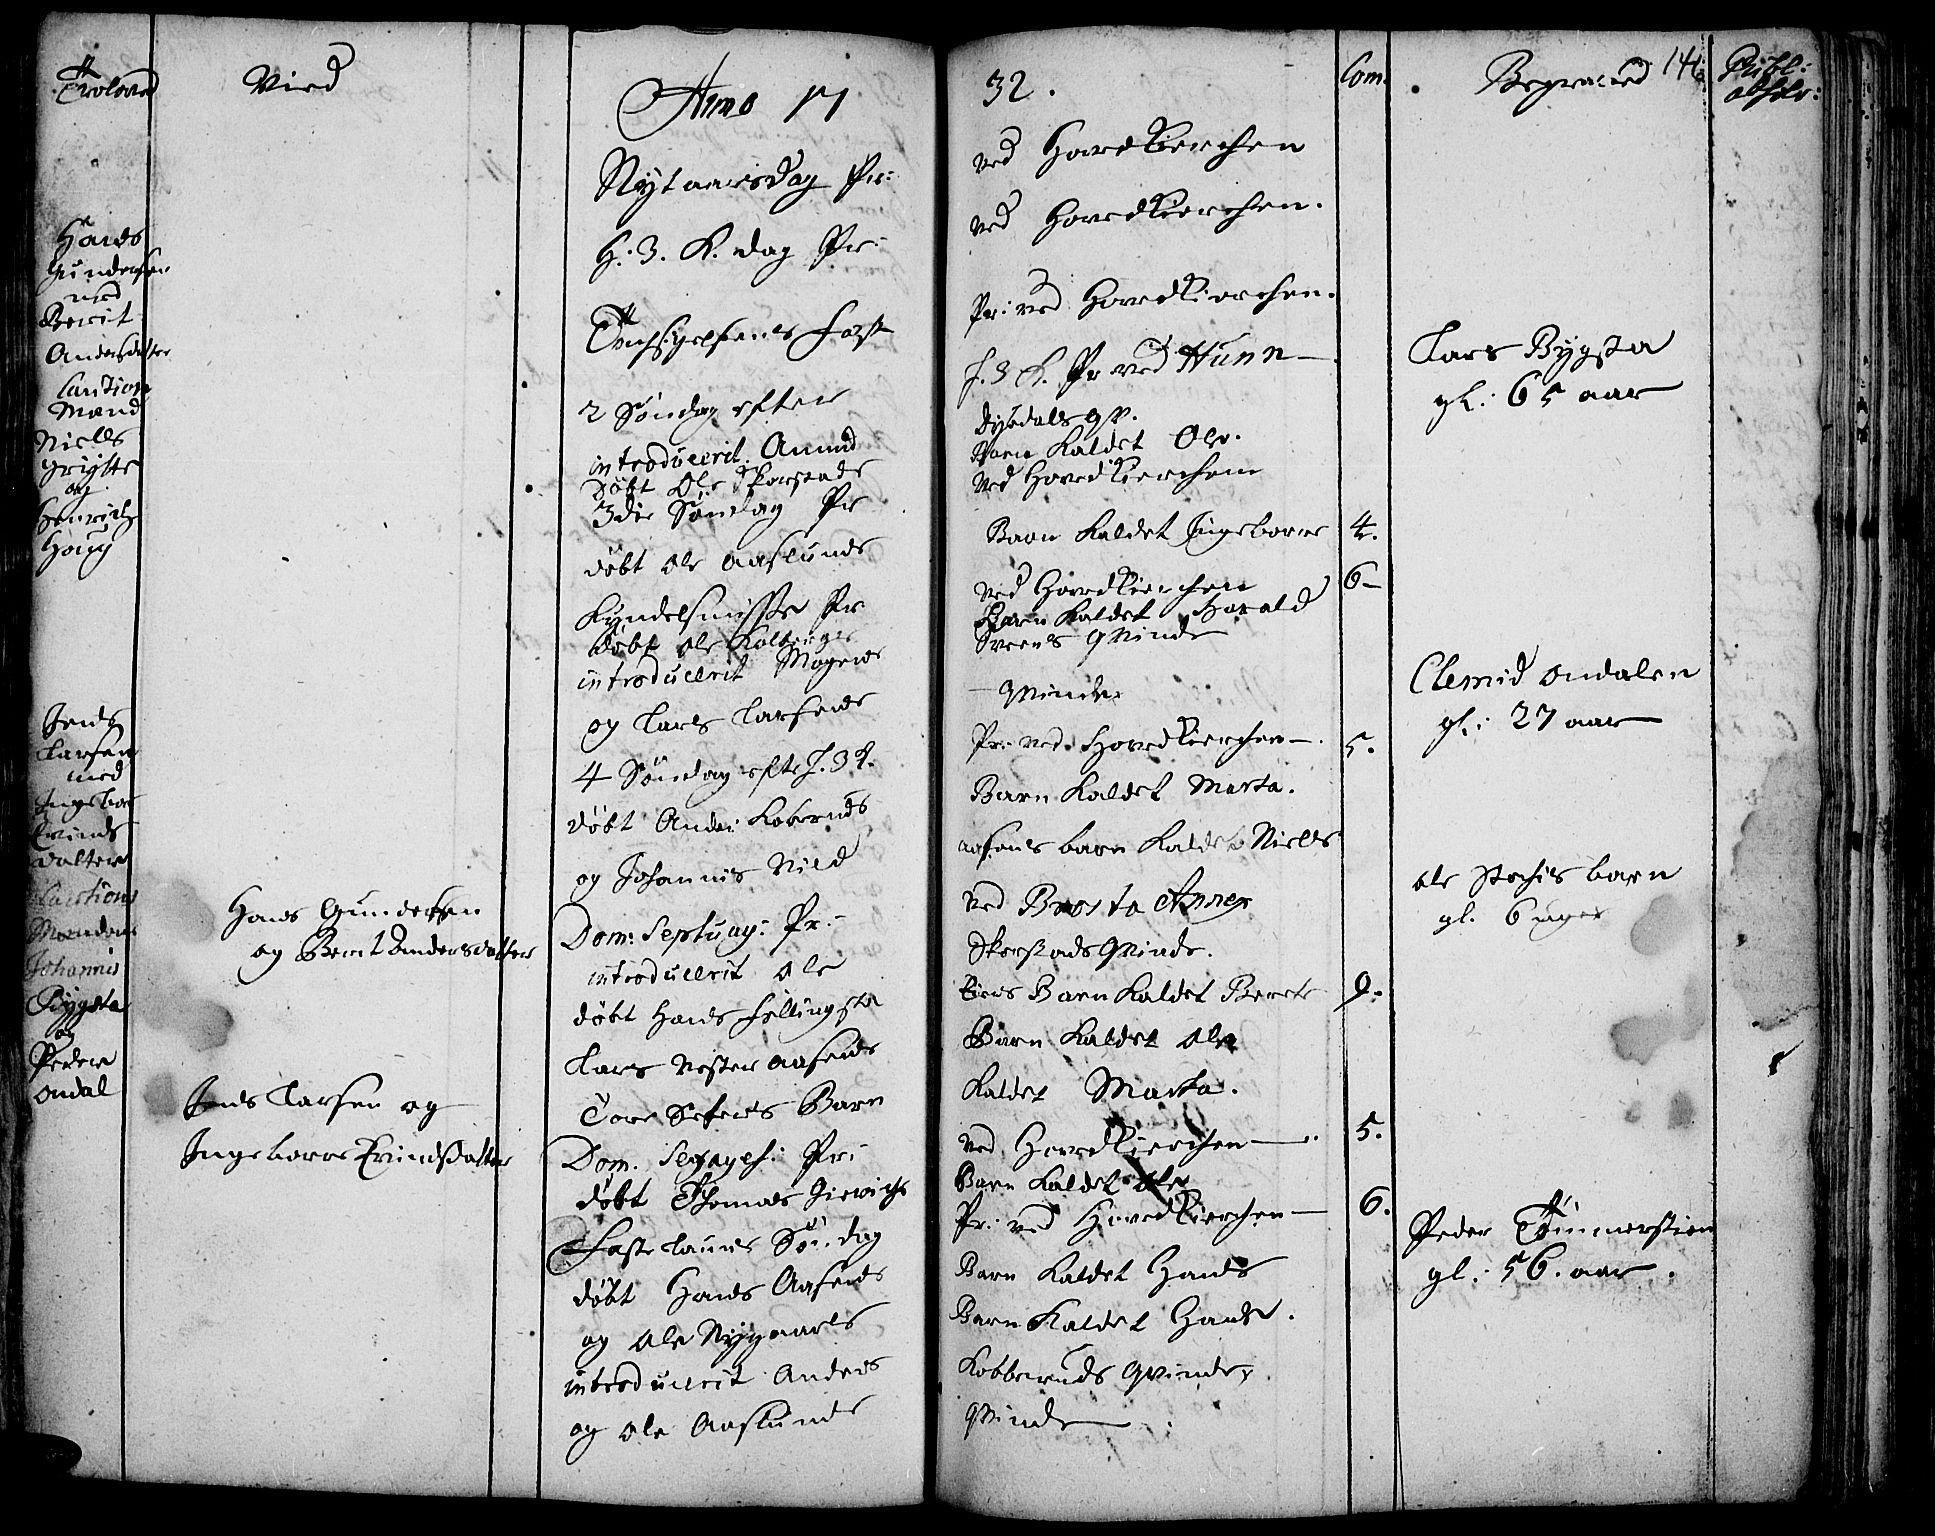 SAH, Vardal prestekontor, H/Ha/Haa/L0001: Ministerialbok nr. 1, 1706-1748, s. 146